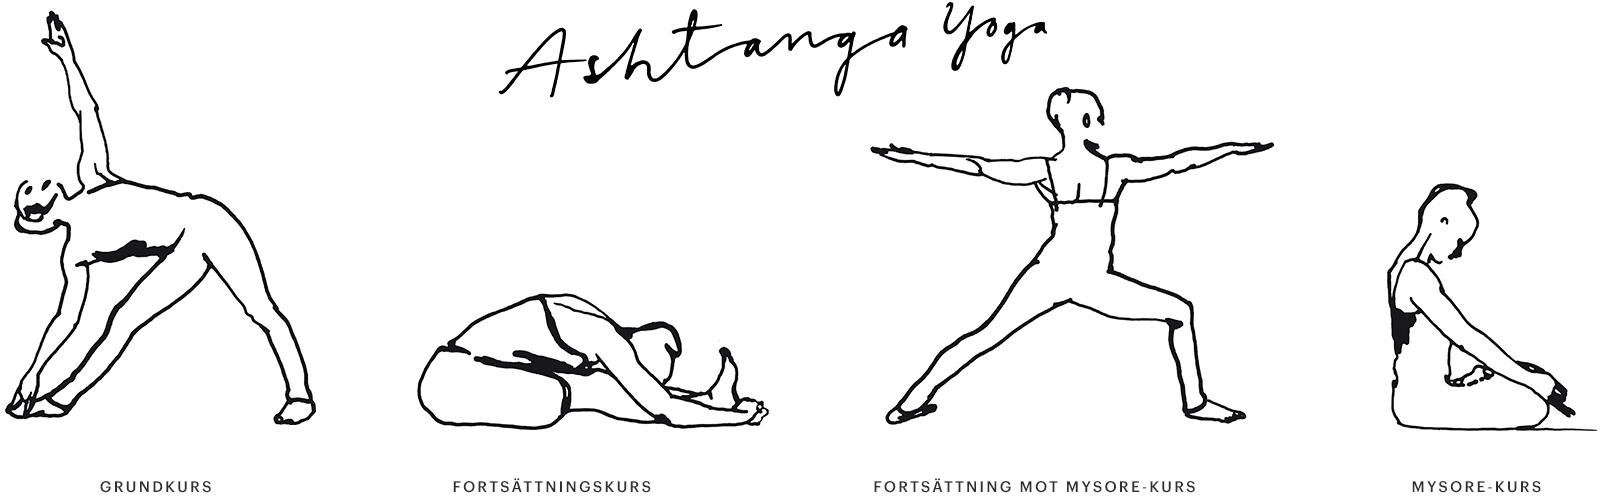 Ashtangayoga Yogashala Stockholm fyra steg till självständig utövare